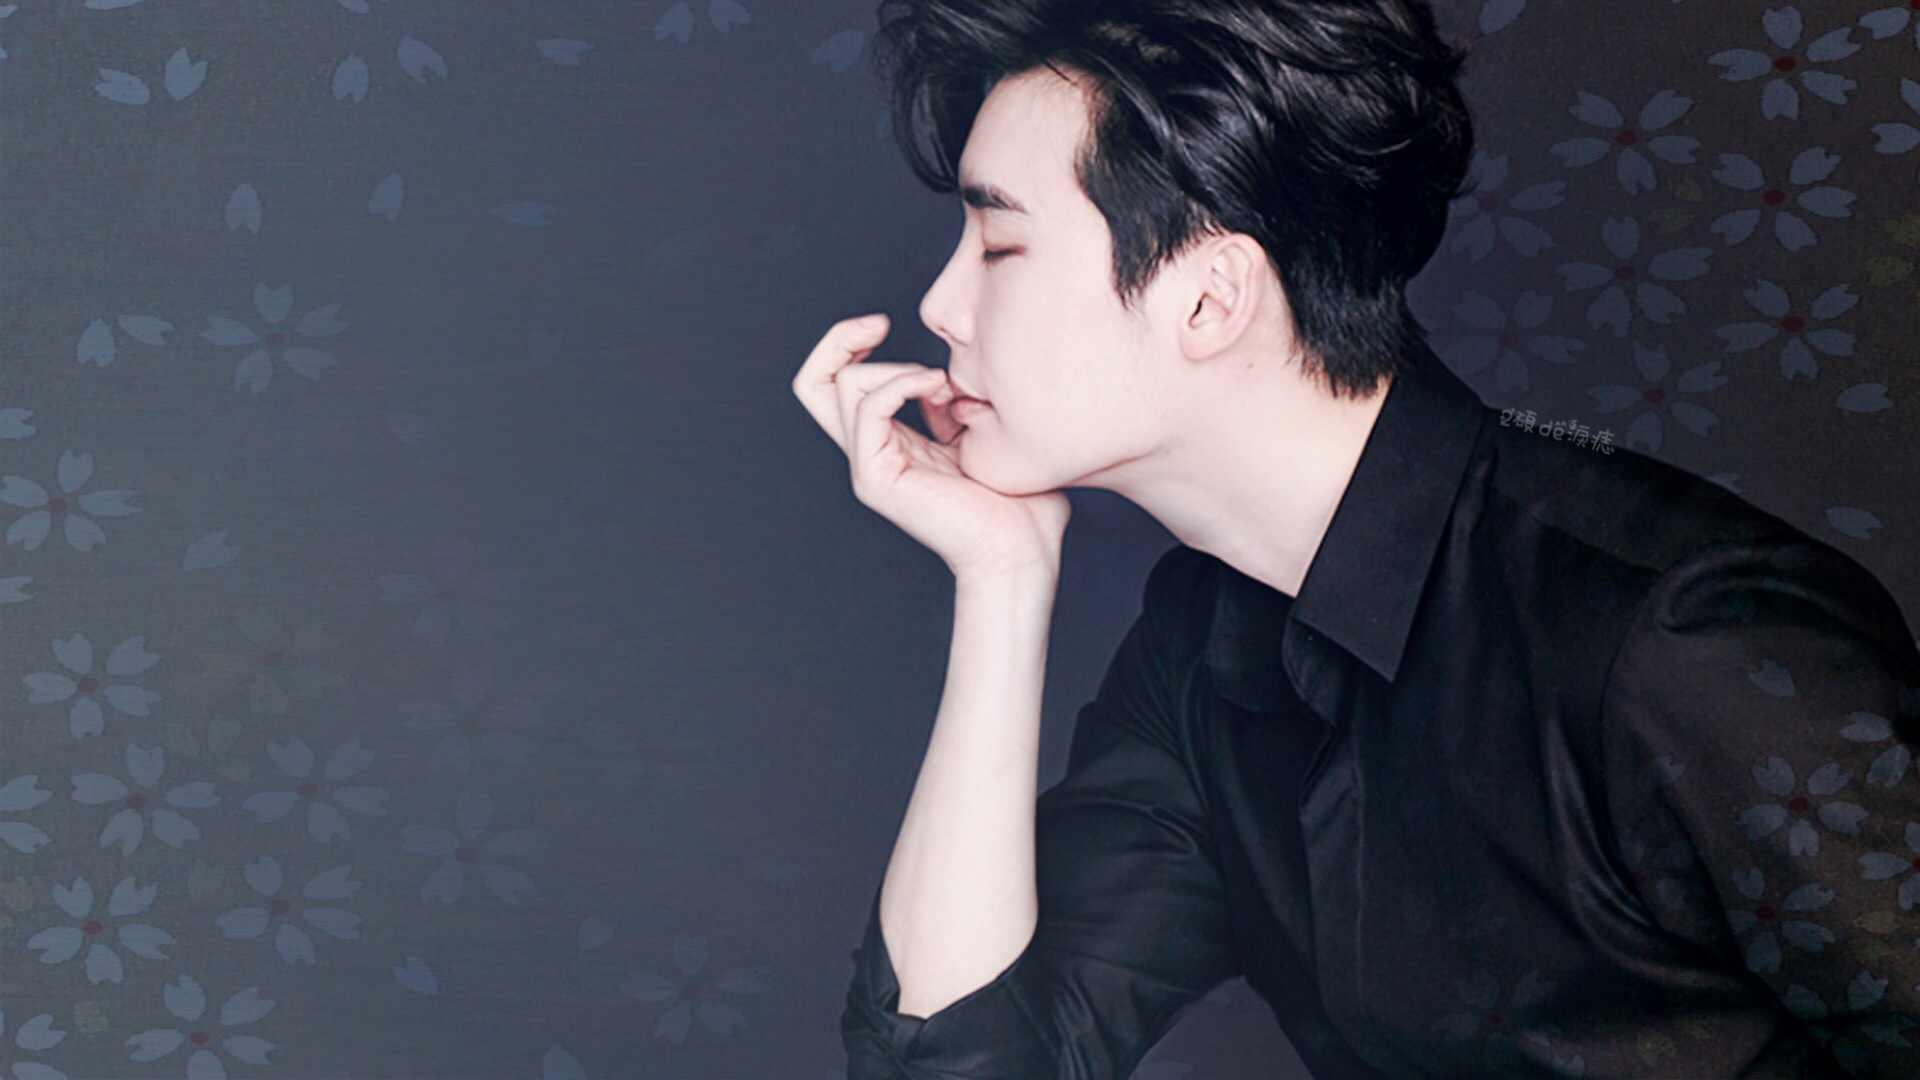 Download Wallpaper Lee Jong Suk Aesthetic Hd Cikimmcom